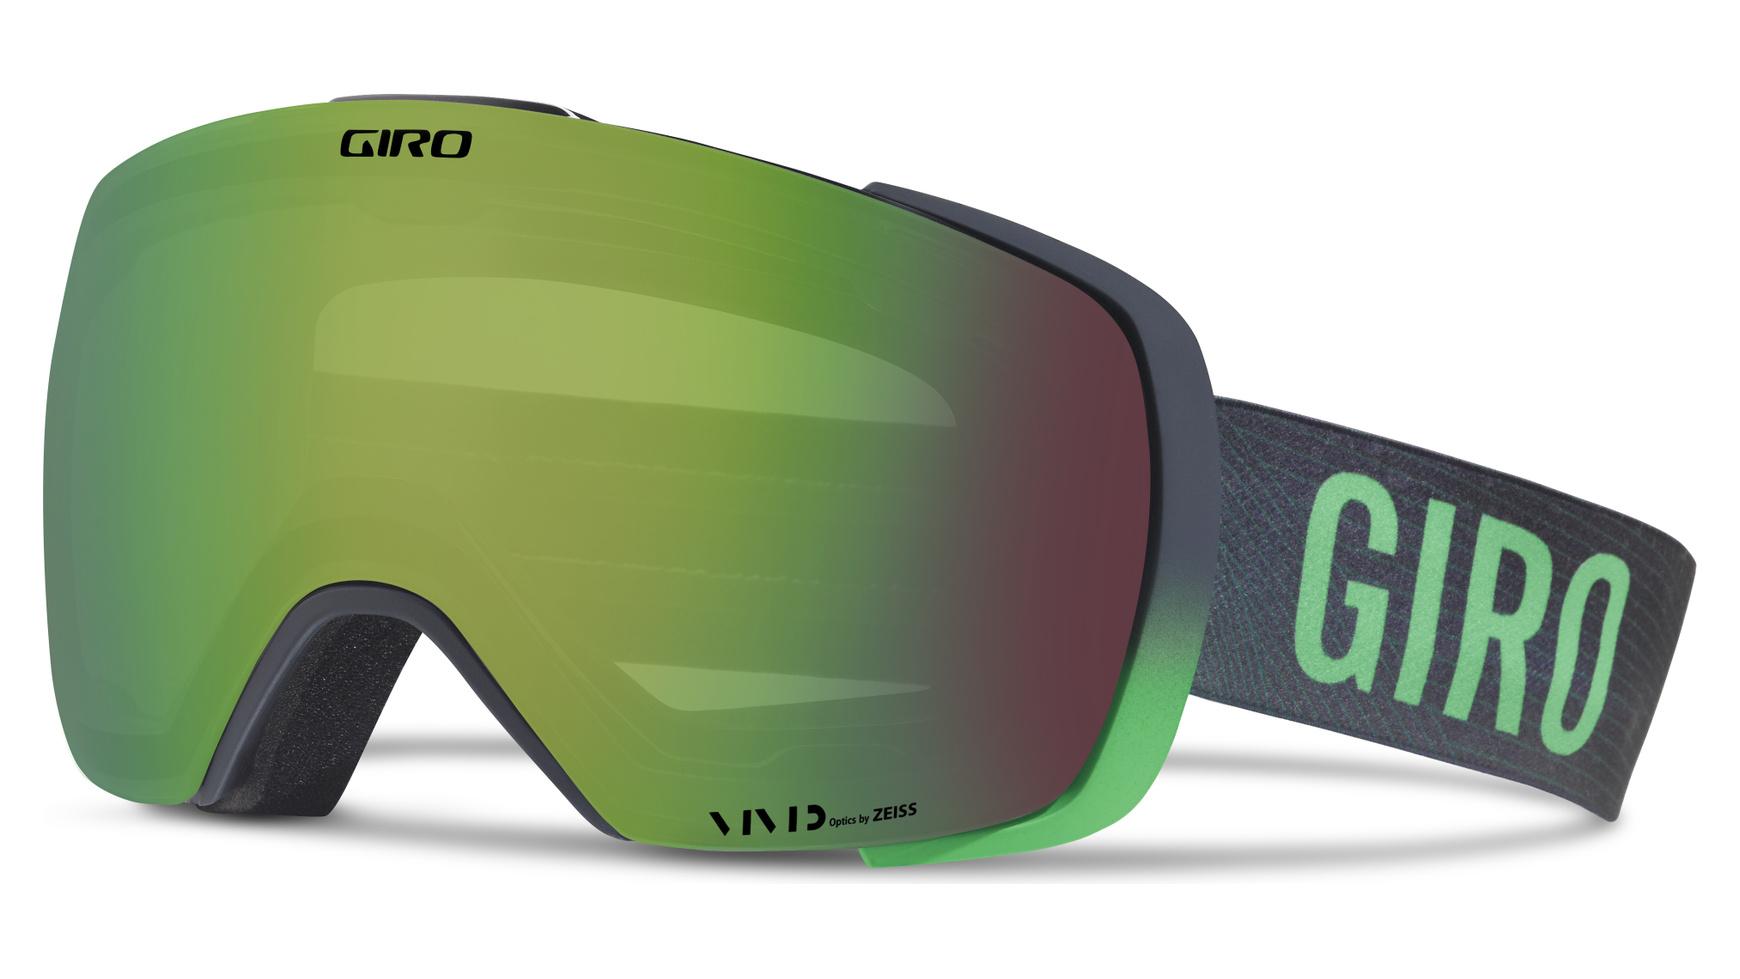 300053009-giro_g_contact_brightgreenturbulencefaded_vividemerald